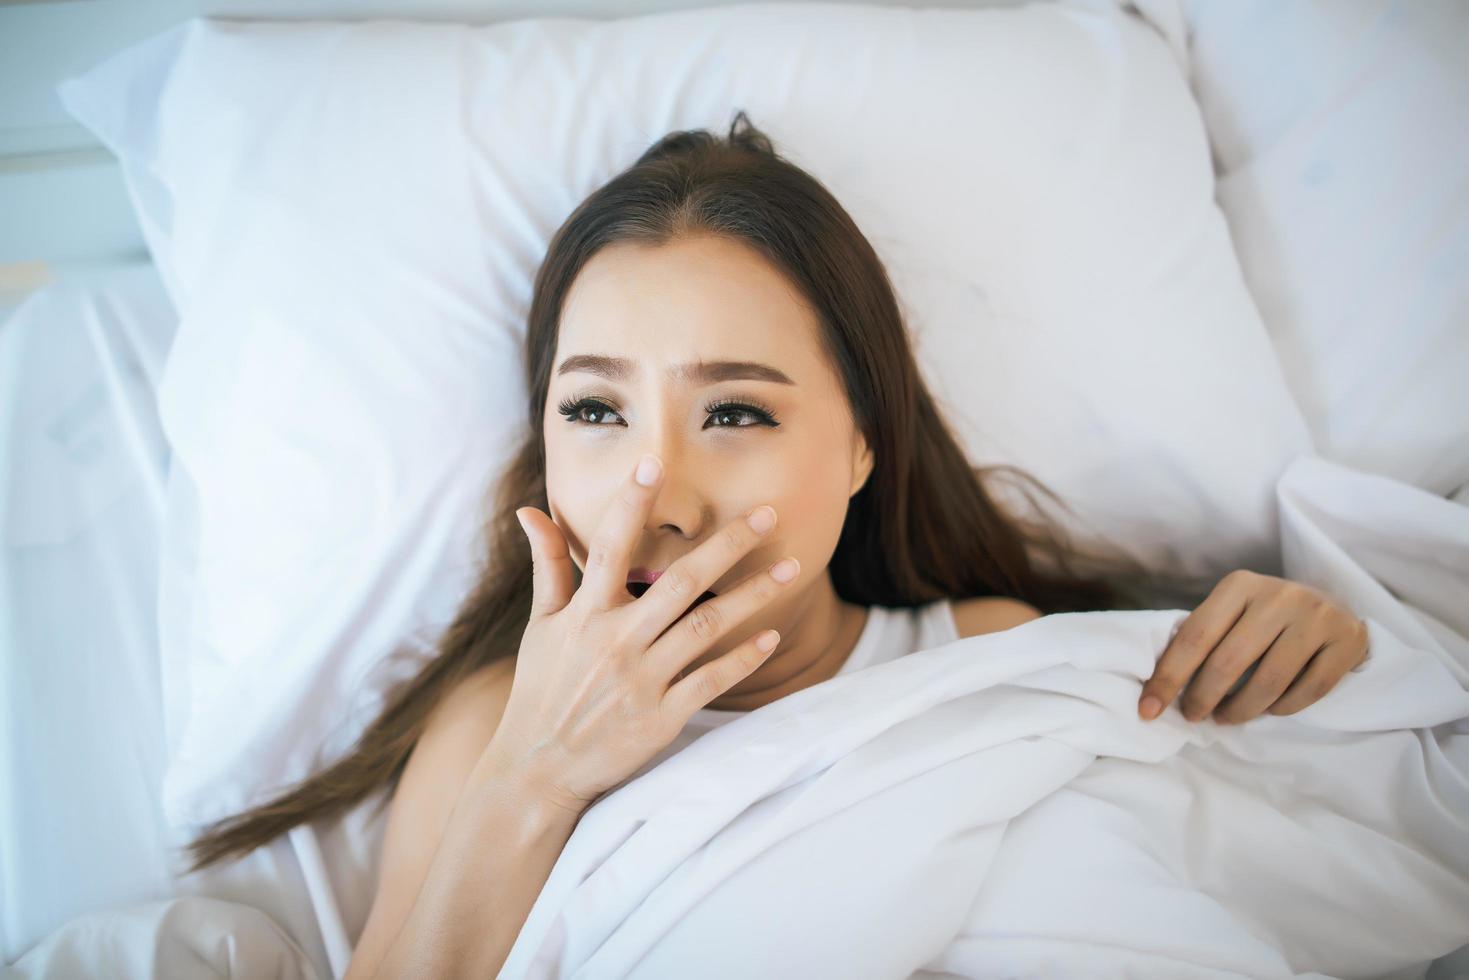 Frau wacht in ihrem Bett auf, faul am Morgen foto